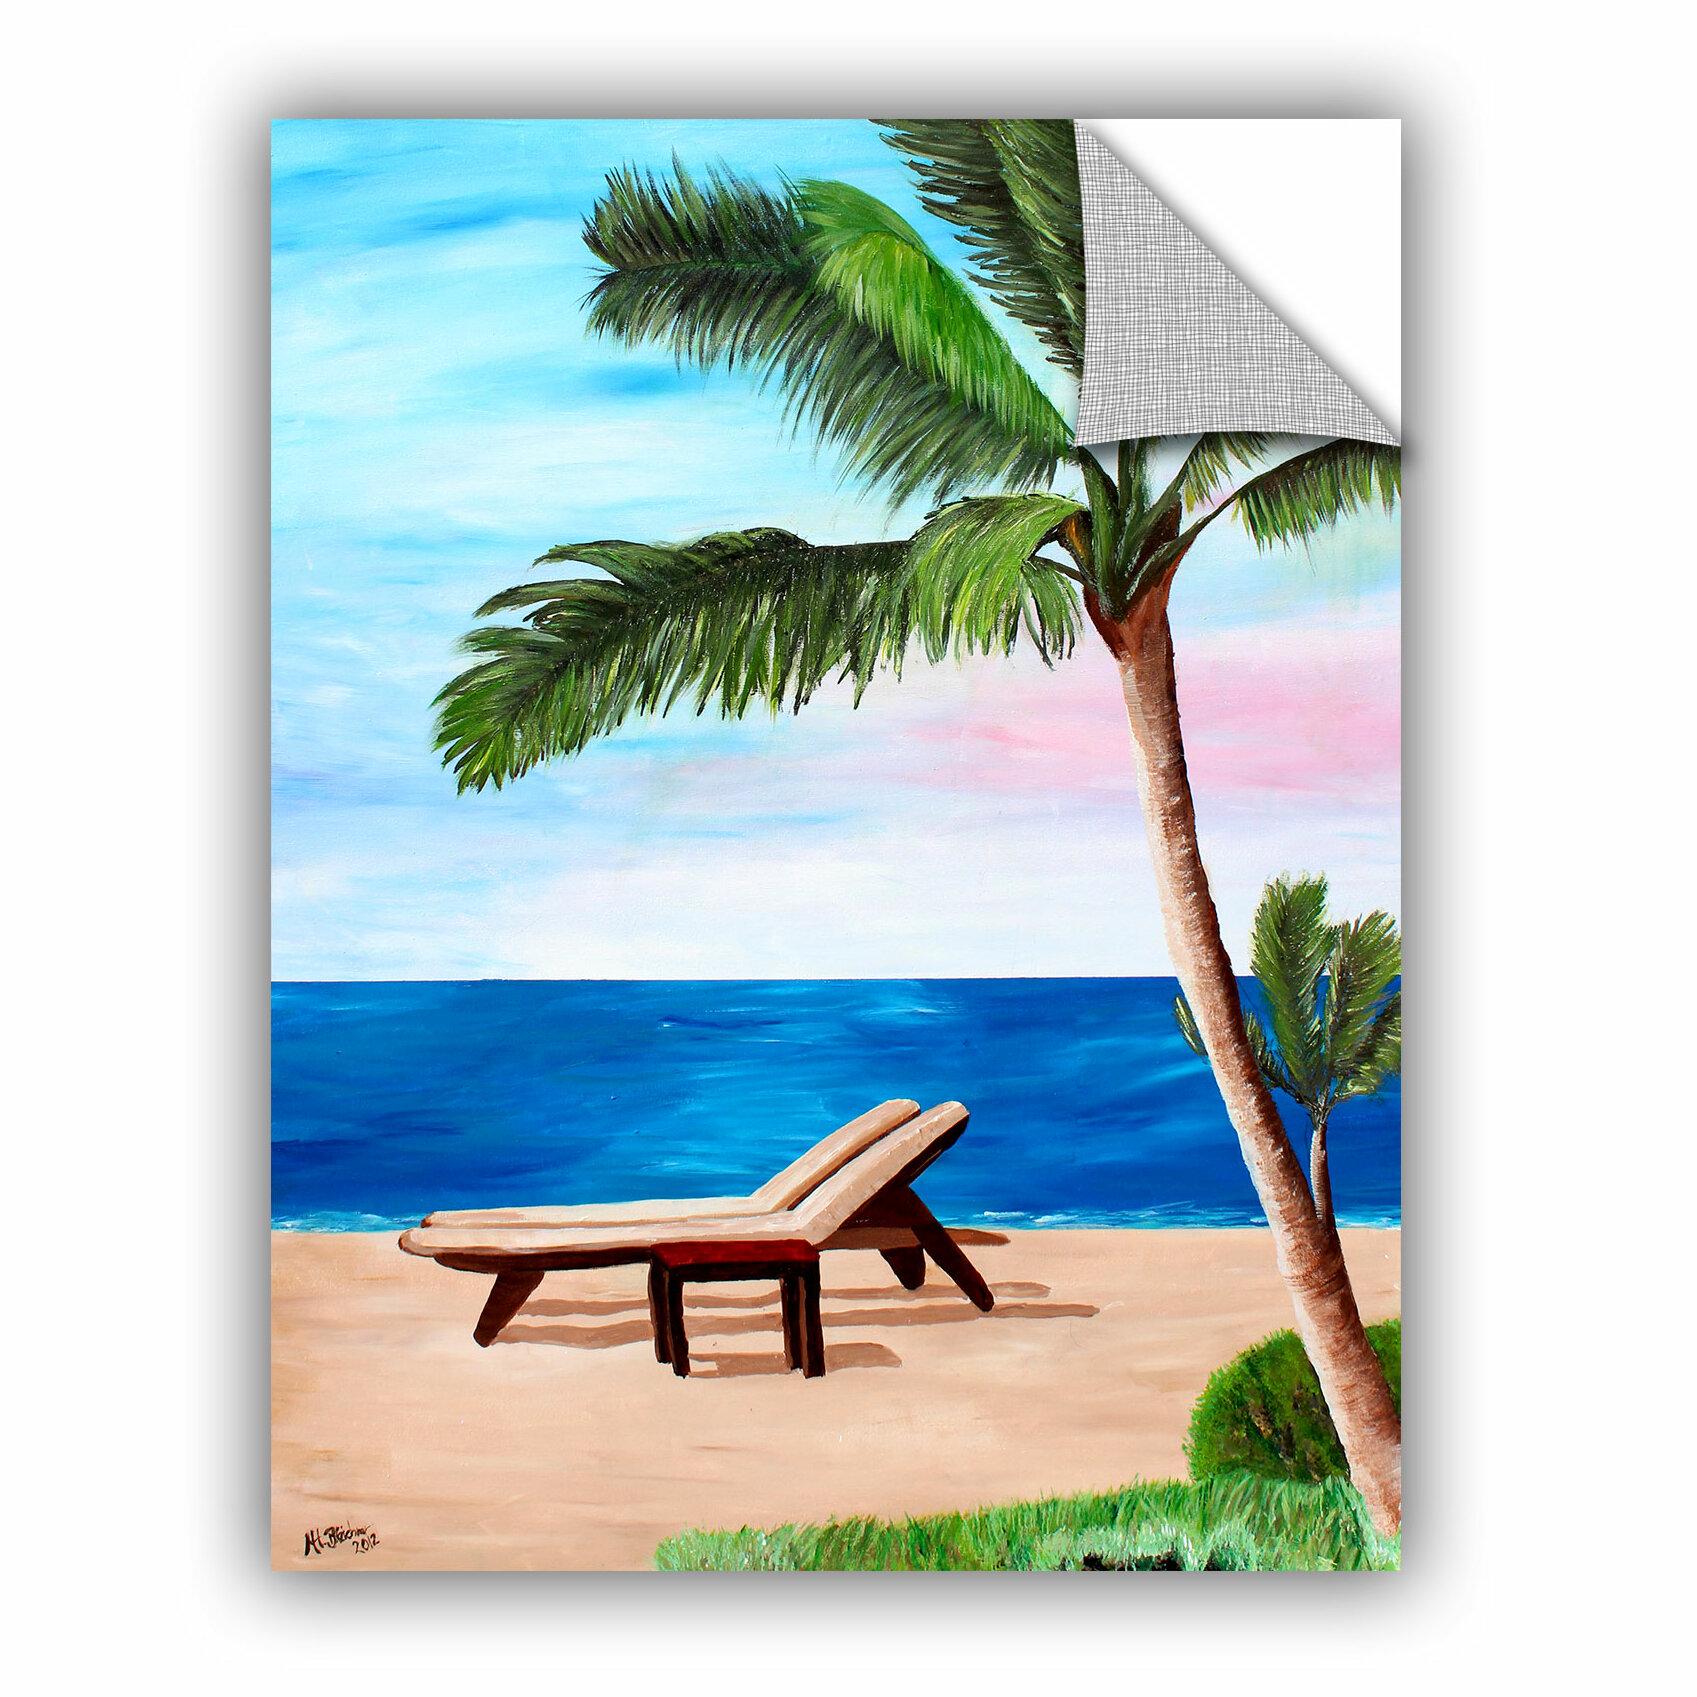 Caribbean Beach: ArtWall ArtApeelz Strand Chairs On Caribbean Beach By